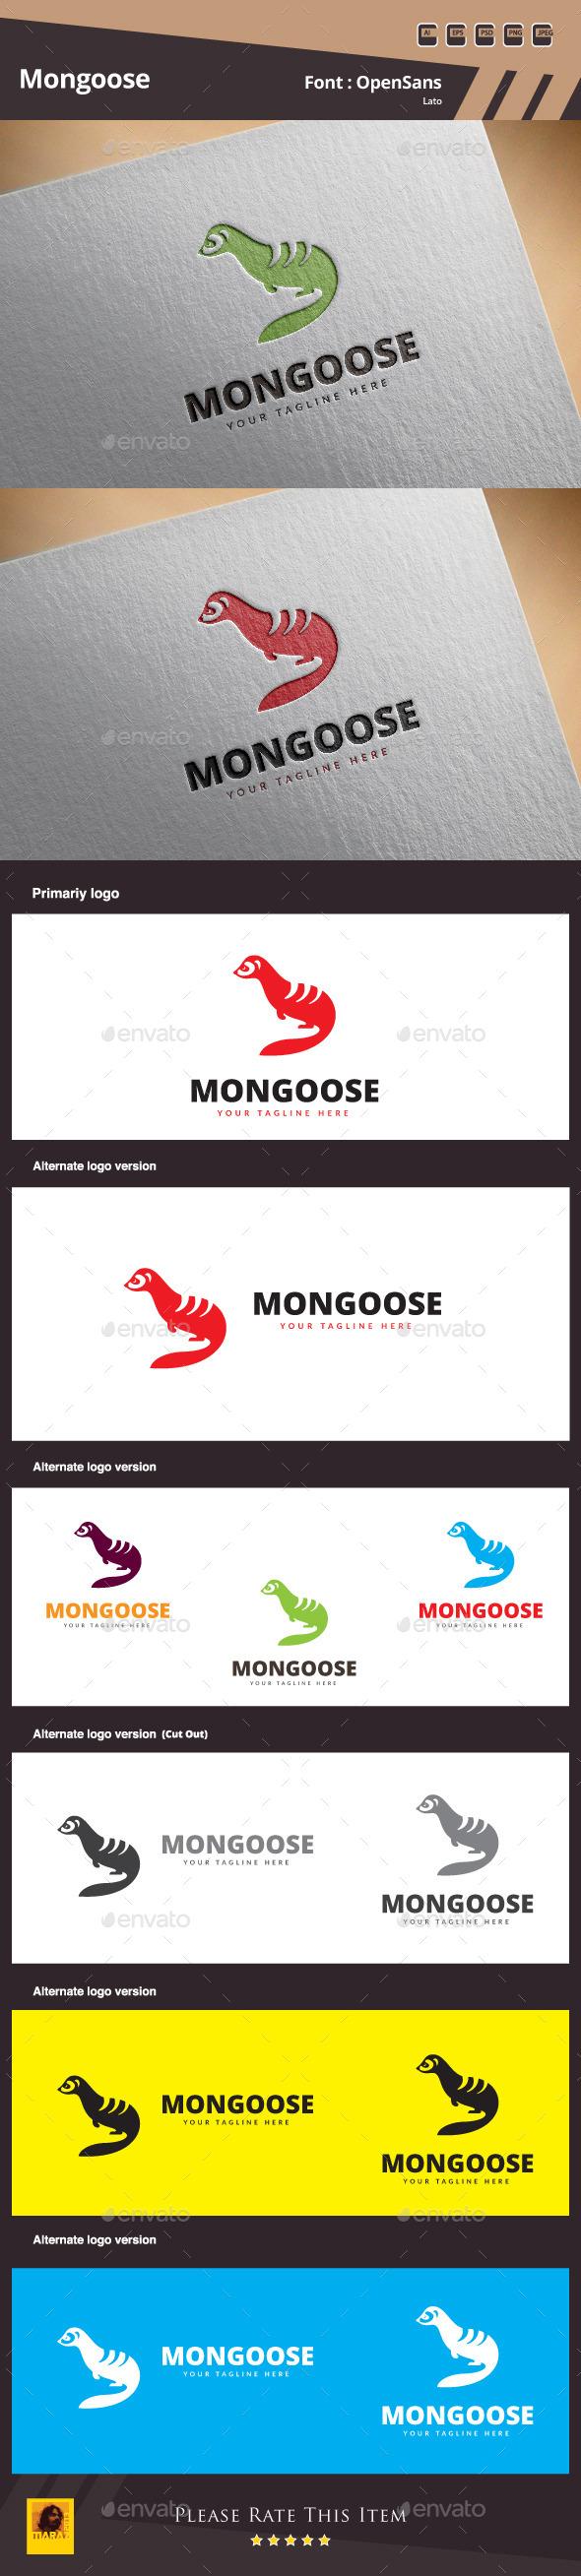 GraphicRiver Mongoose Logo Template 11052836